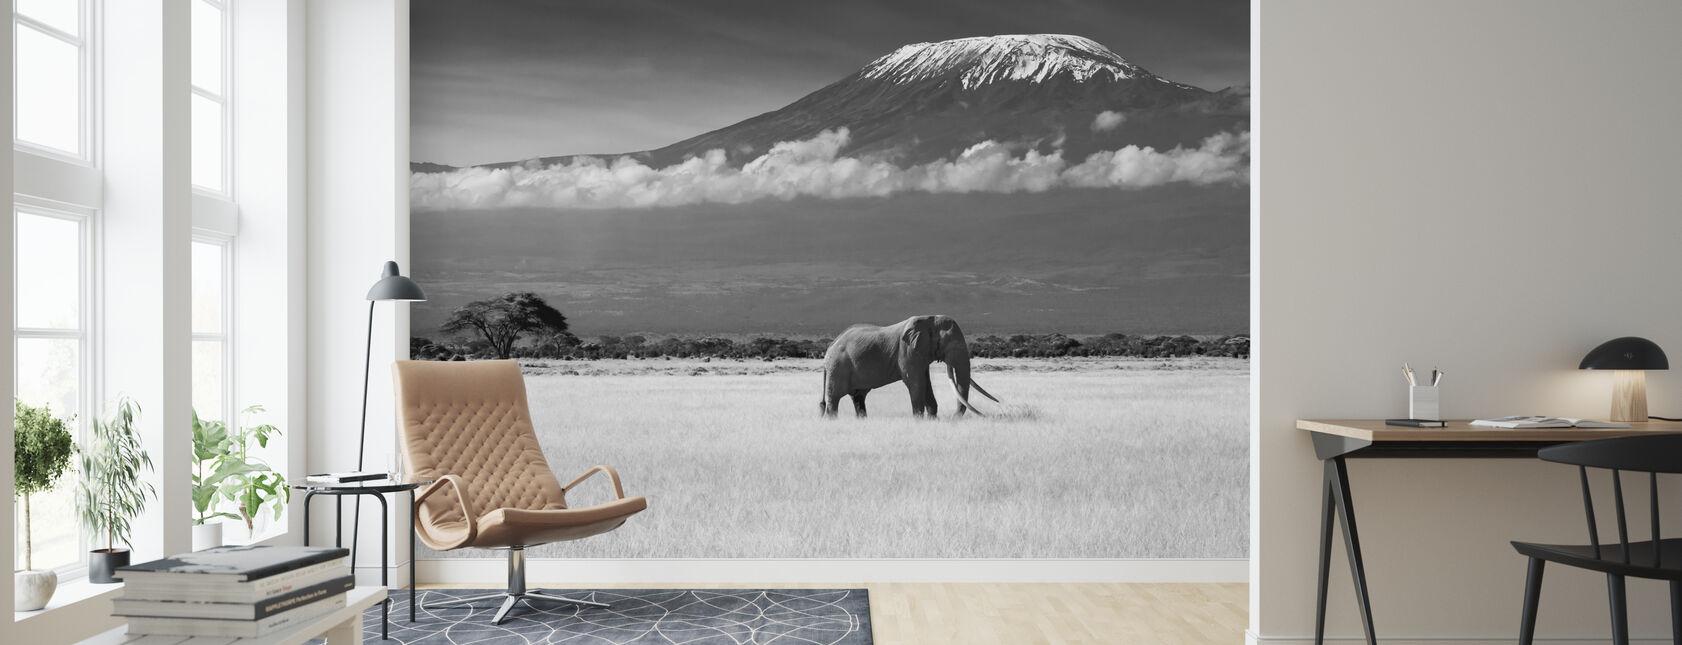 Elephant Landscape - Wallpaper - Living Room